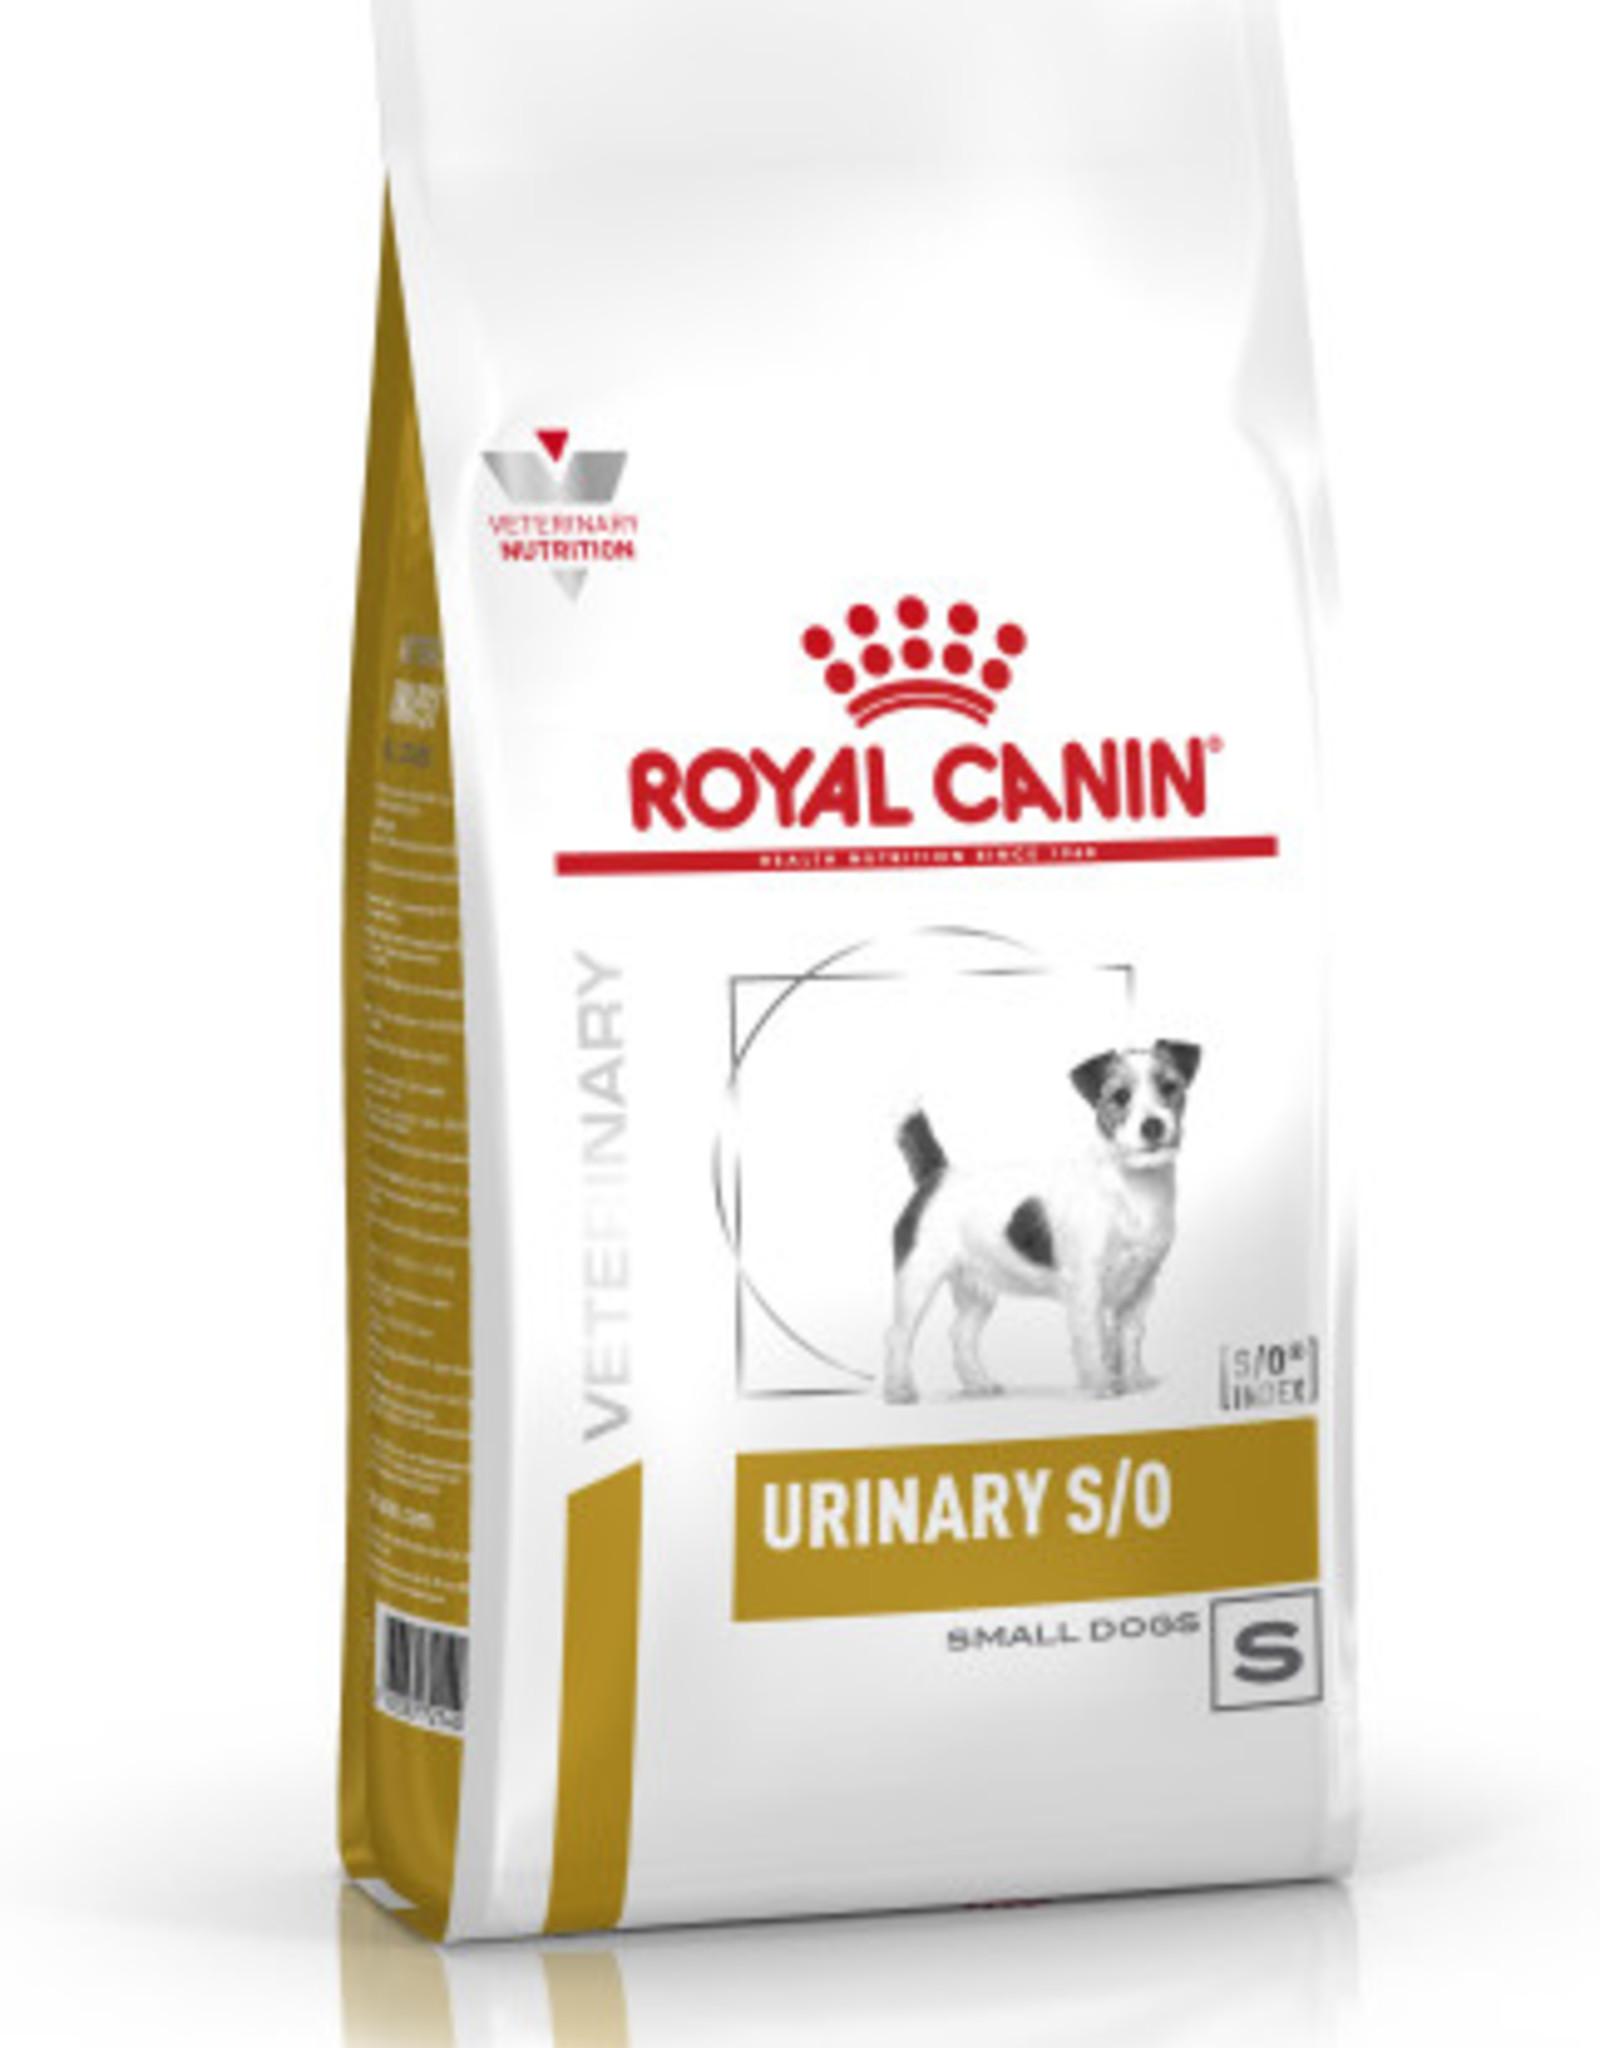 Royal Canin Royal Canin Urinary S/o Small Hond 8kg